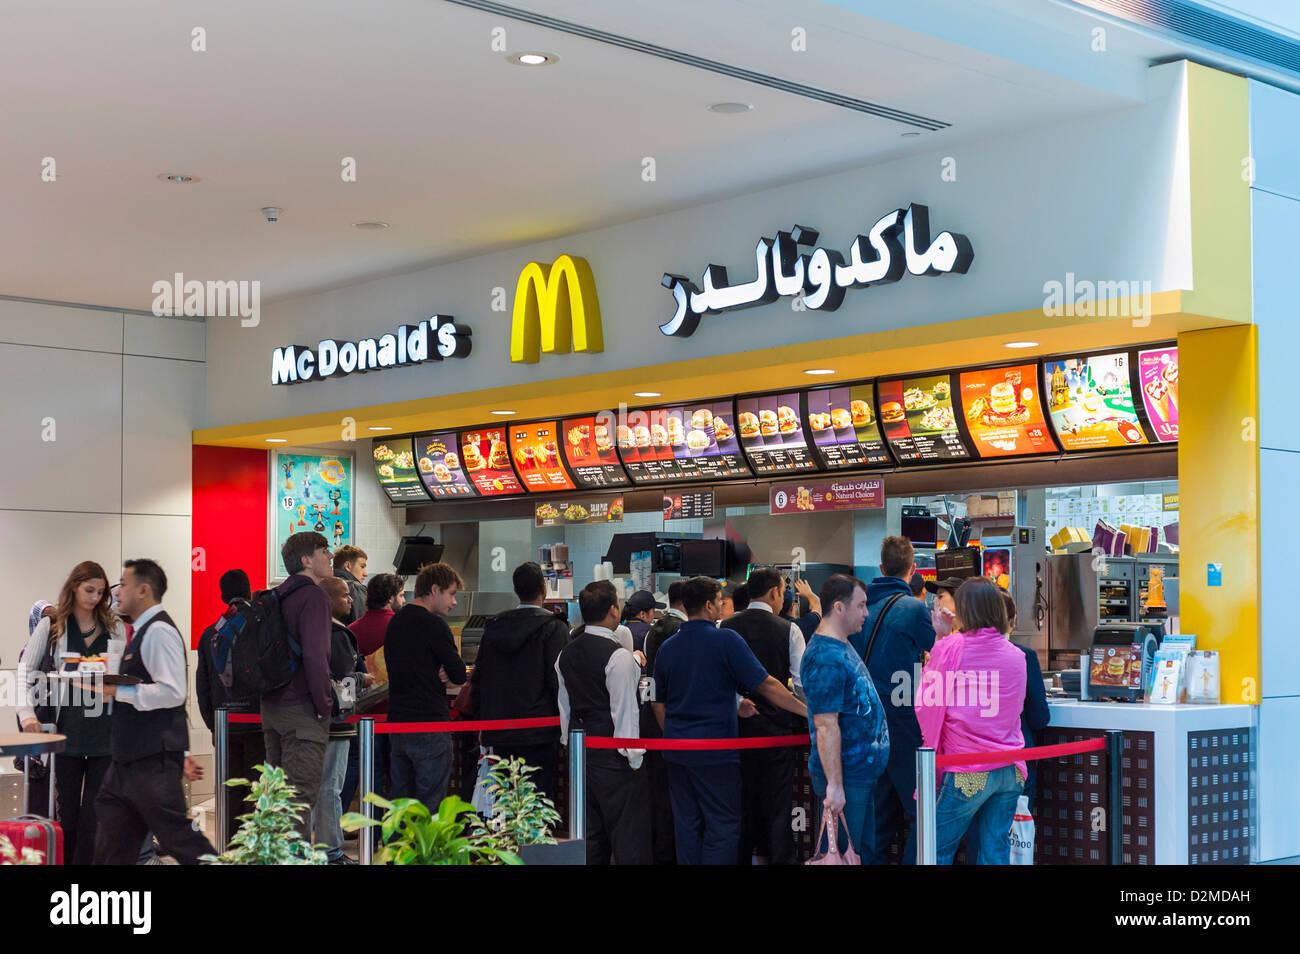 McDonald's at Dubai International Airport - Stock Image